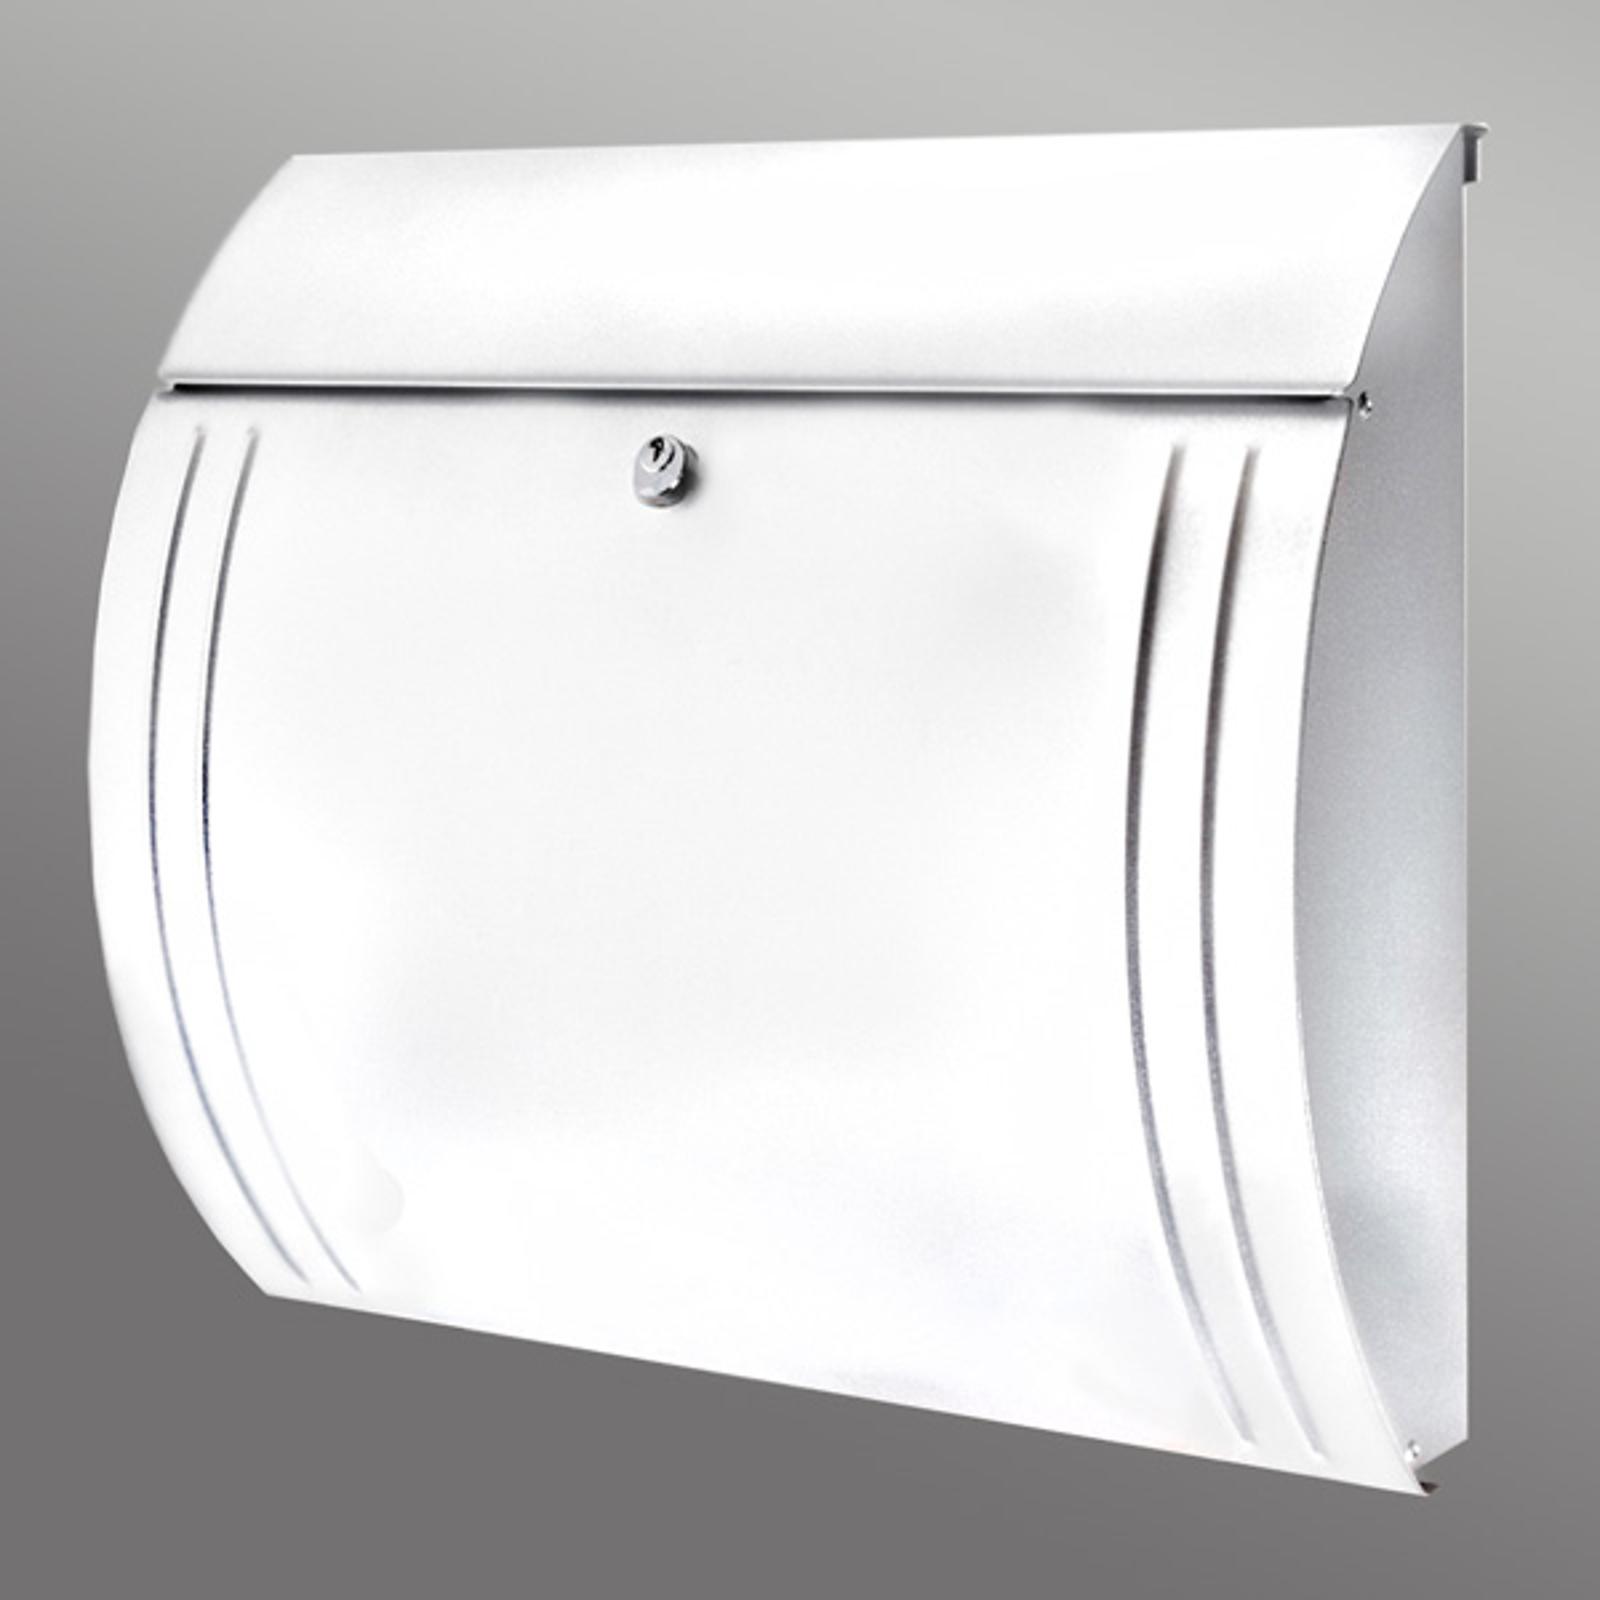 Bella cassetta postale Modena di acciaio, bianco